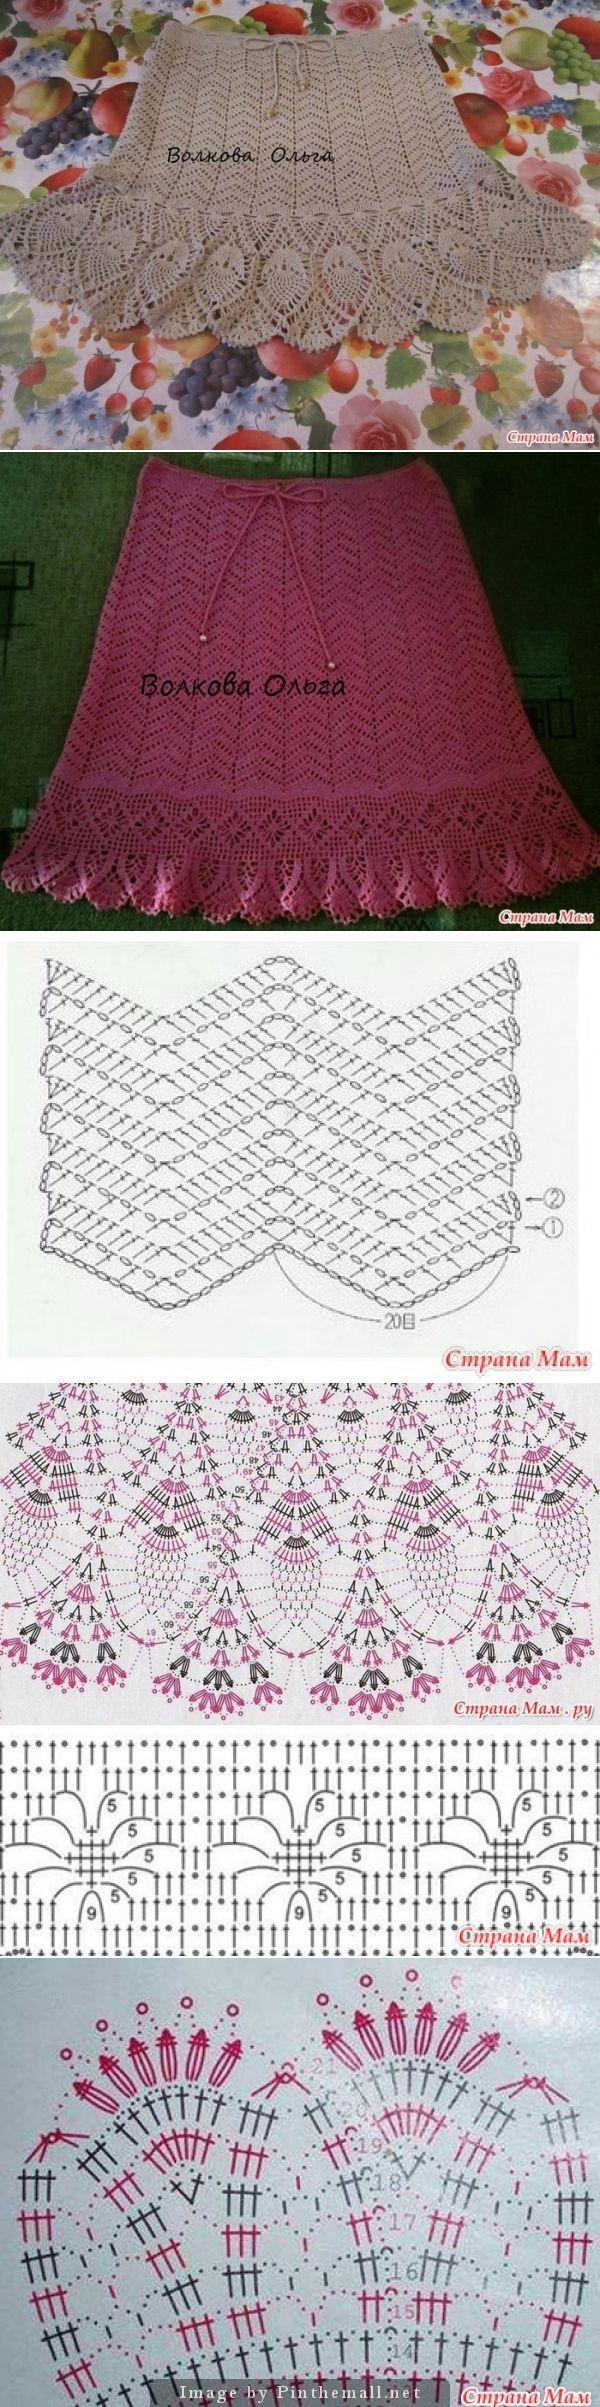 Crochet skirt ----- http://www.liveinternet.ru/users/4620503/rubric/2445801/page117.html crochet stitch pattern women